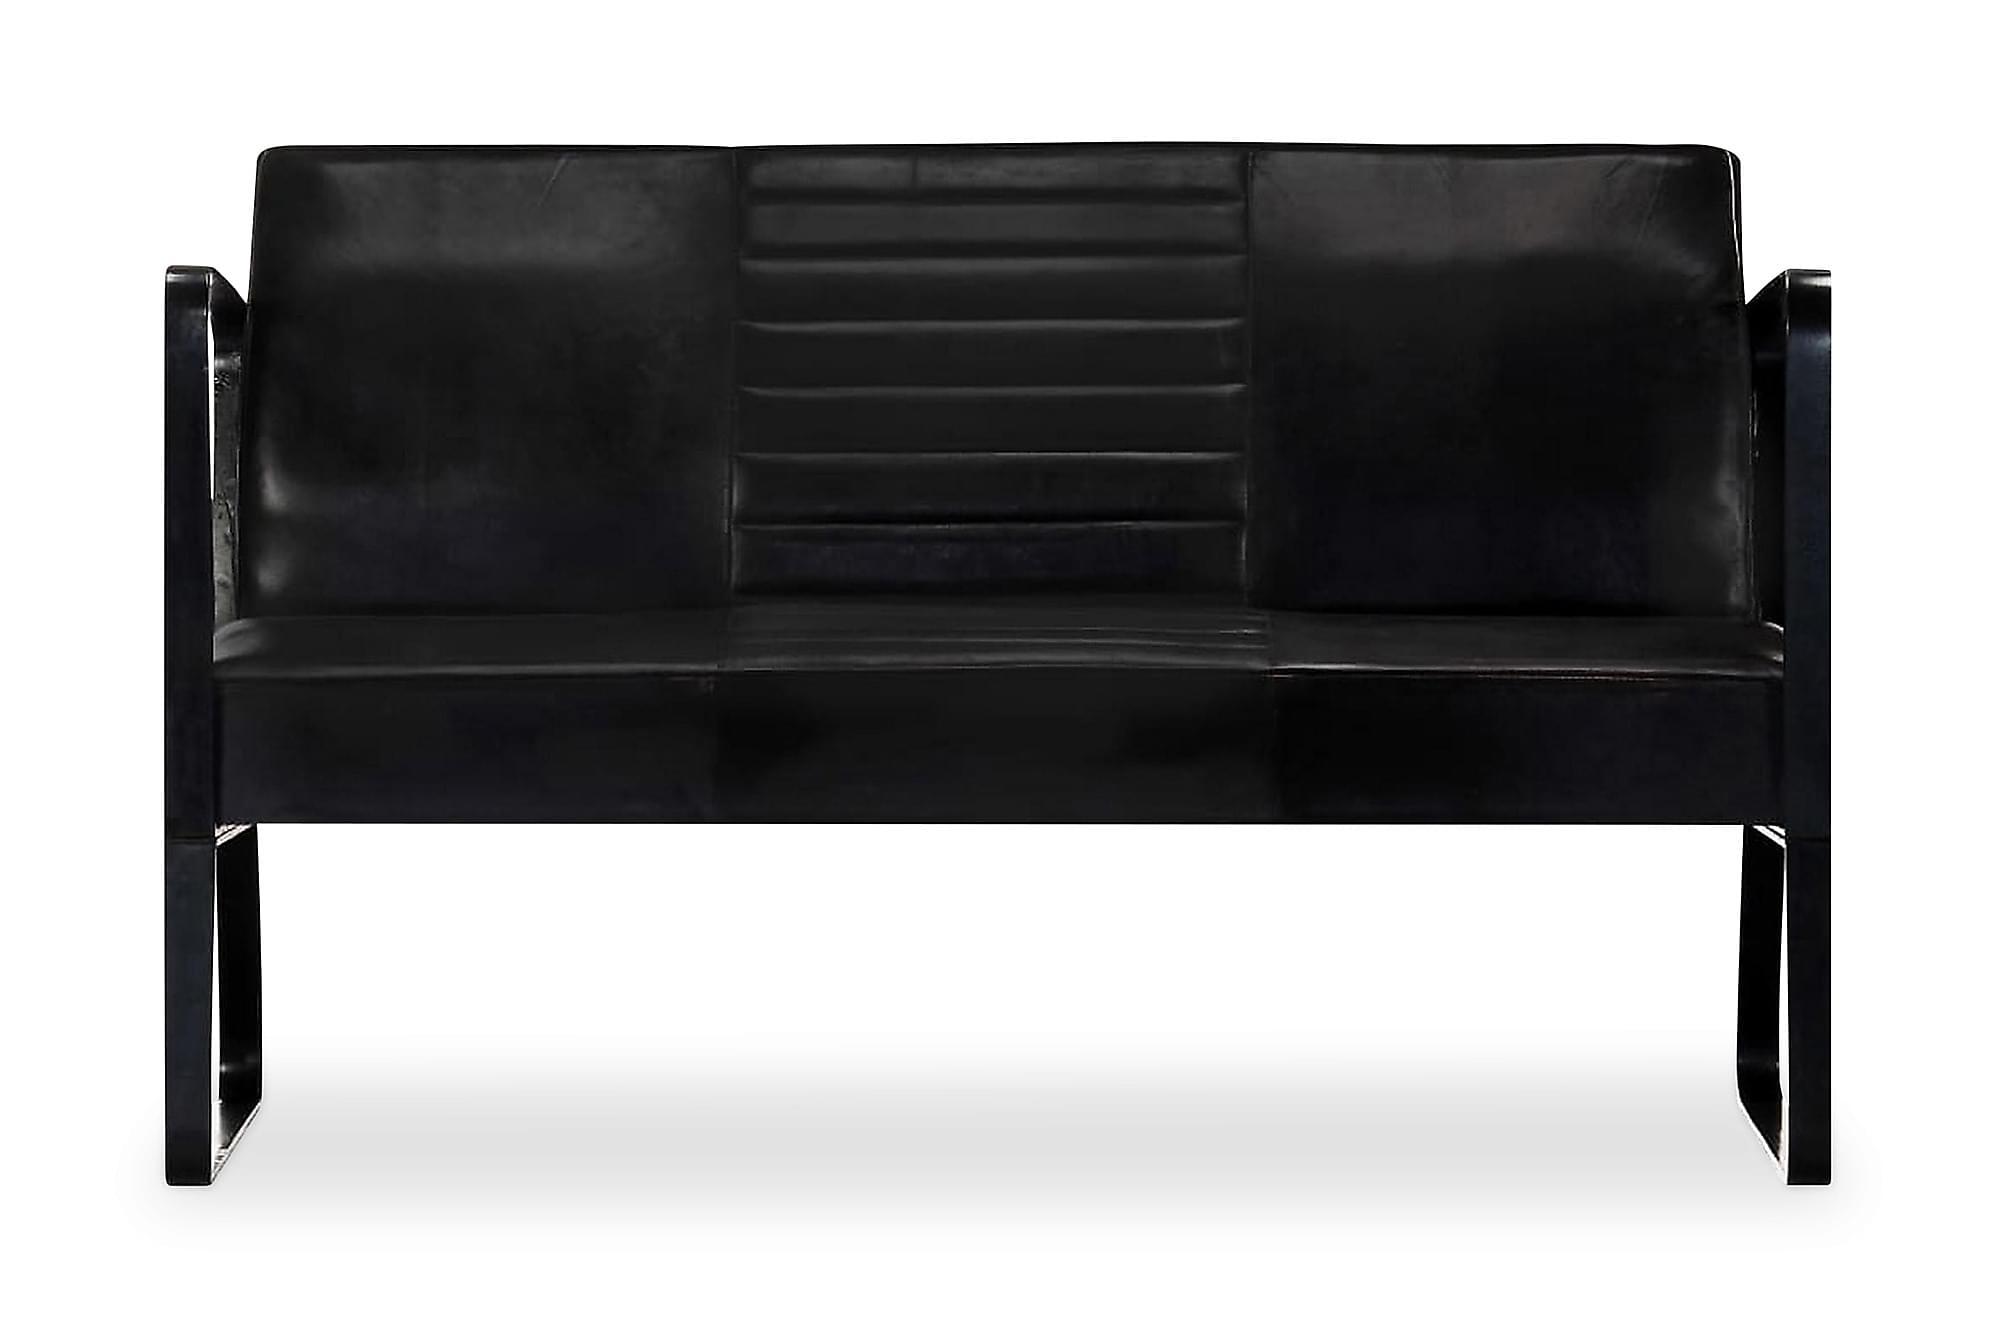 2-sitssoffa äkta läder svart, Skinnsoffor